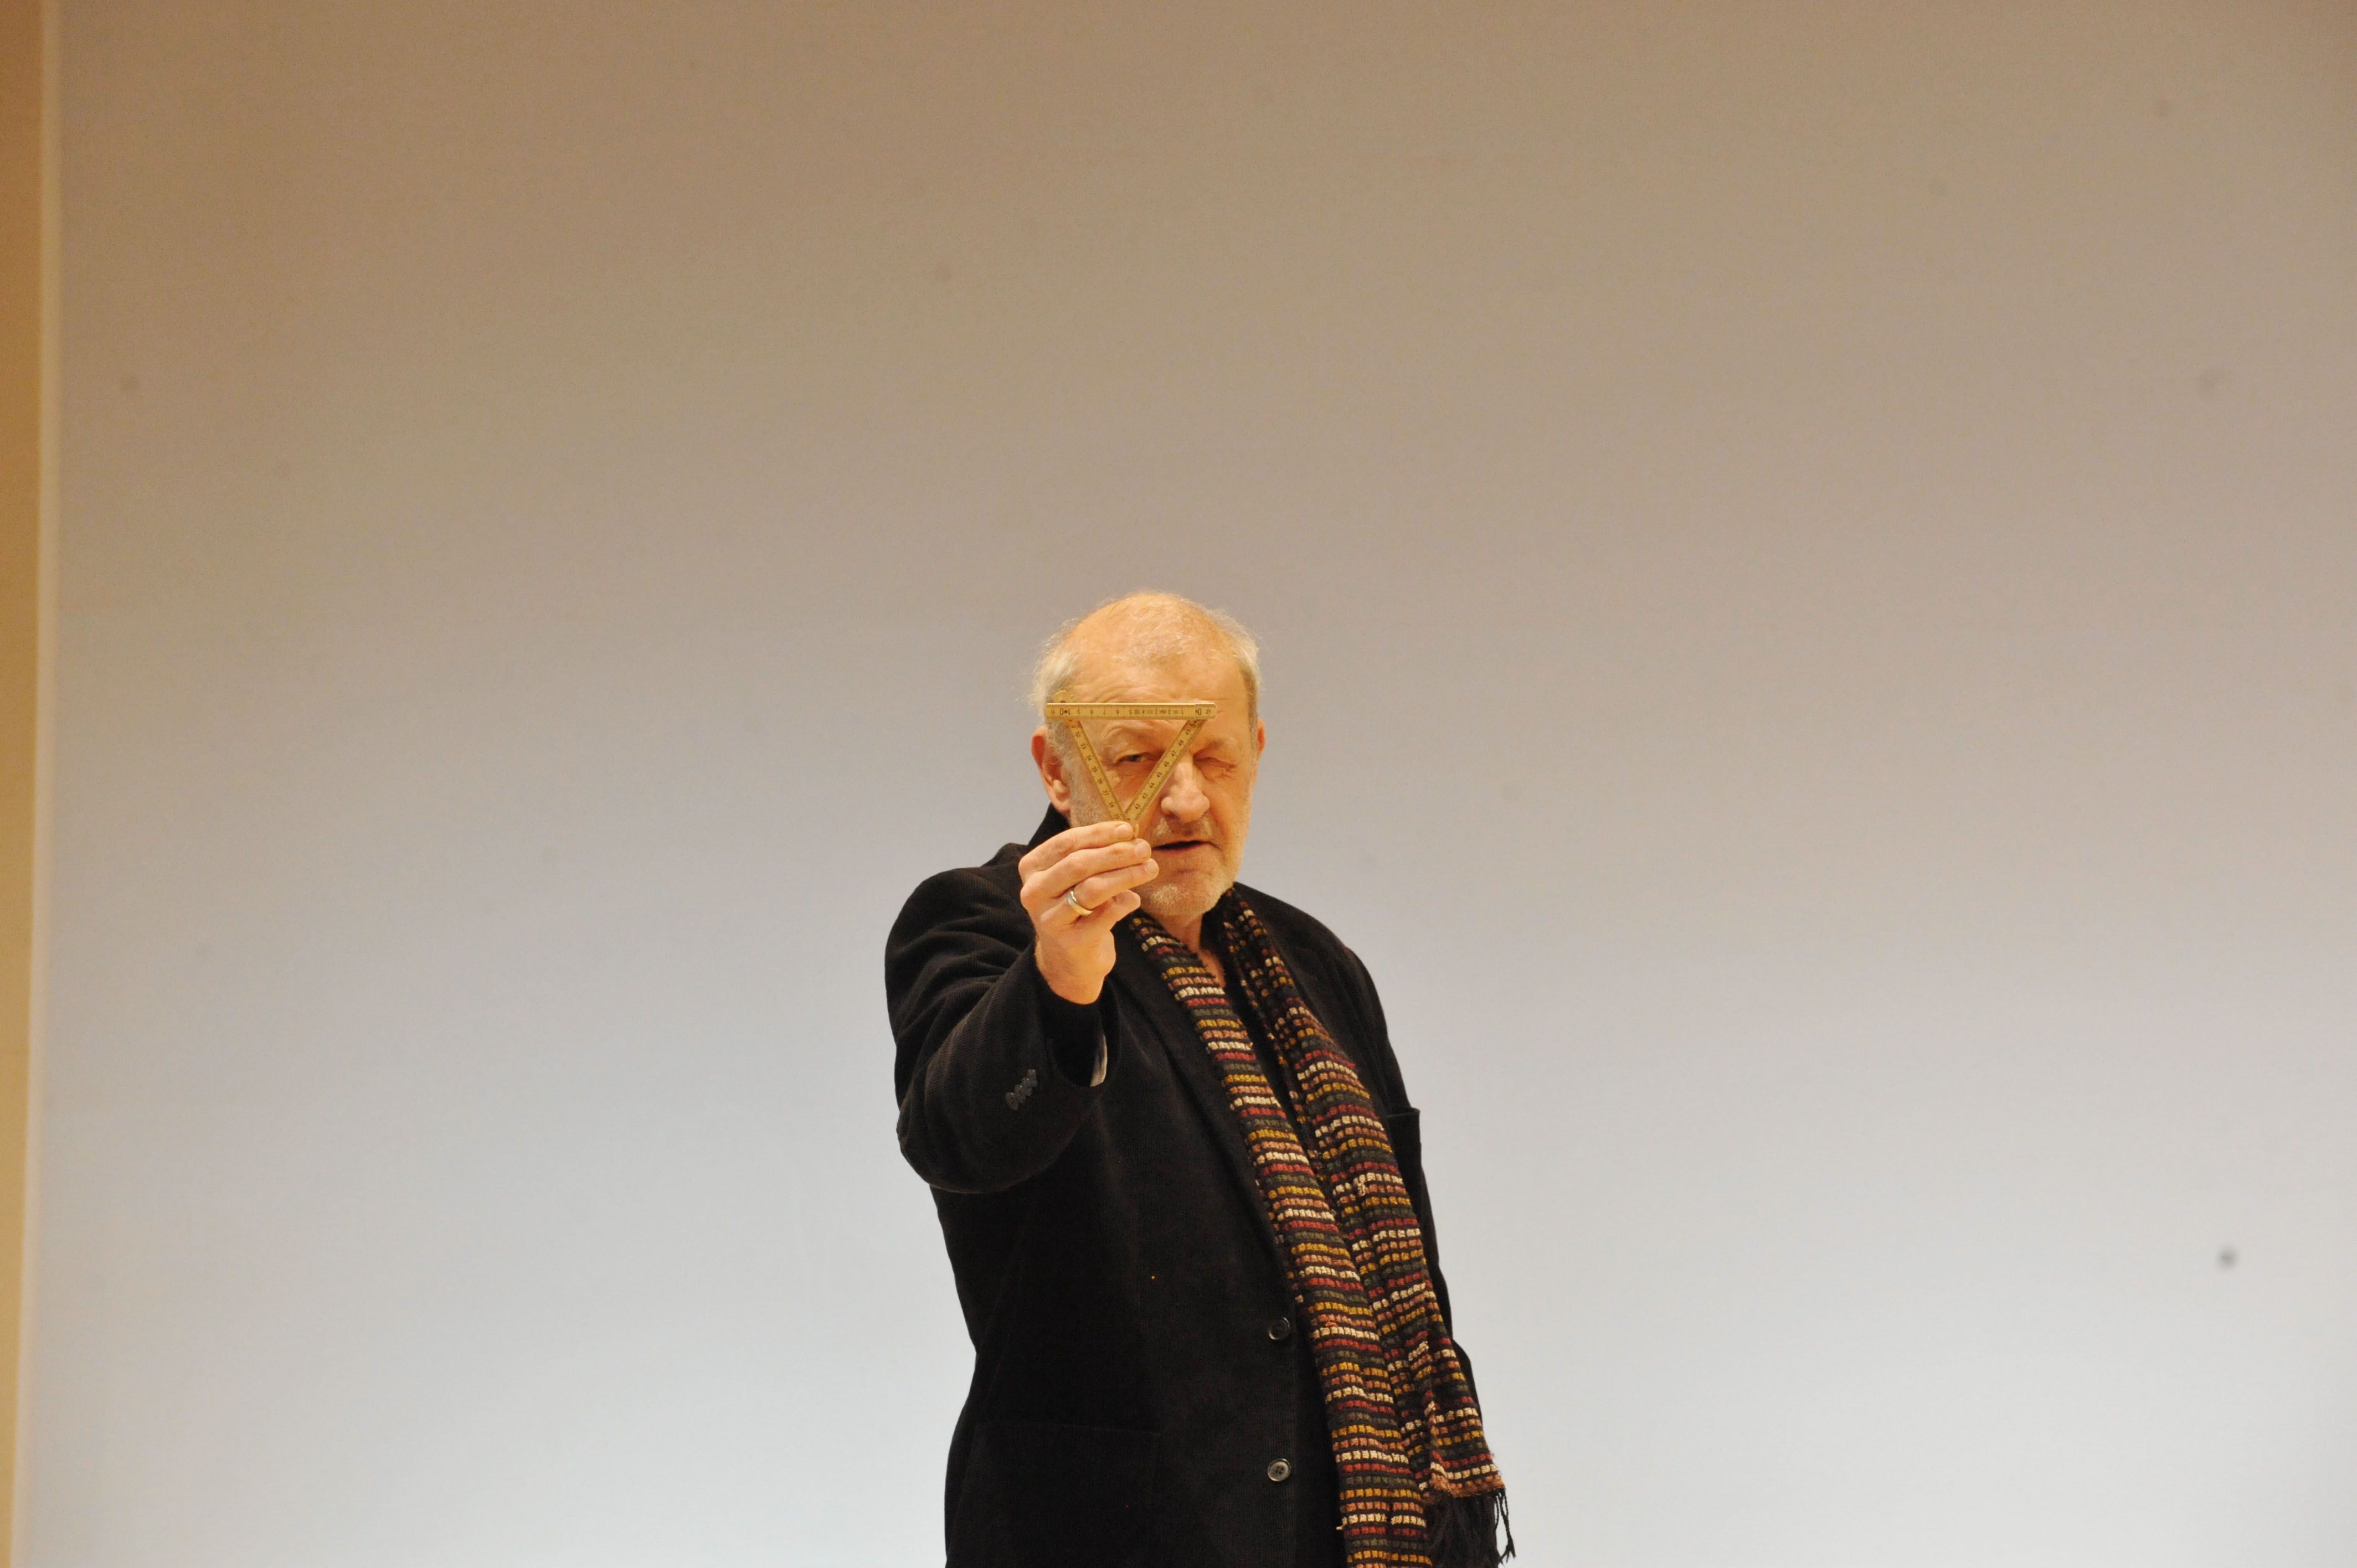 Foto: Jürgen Frahm